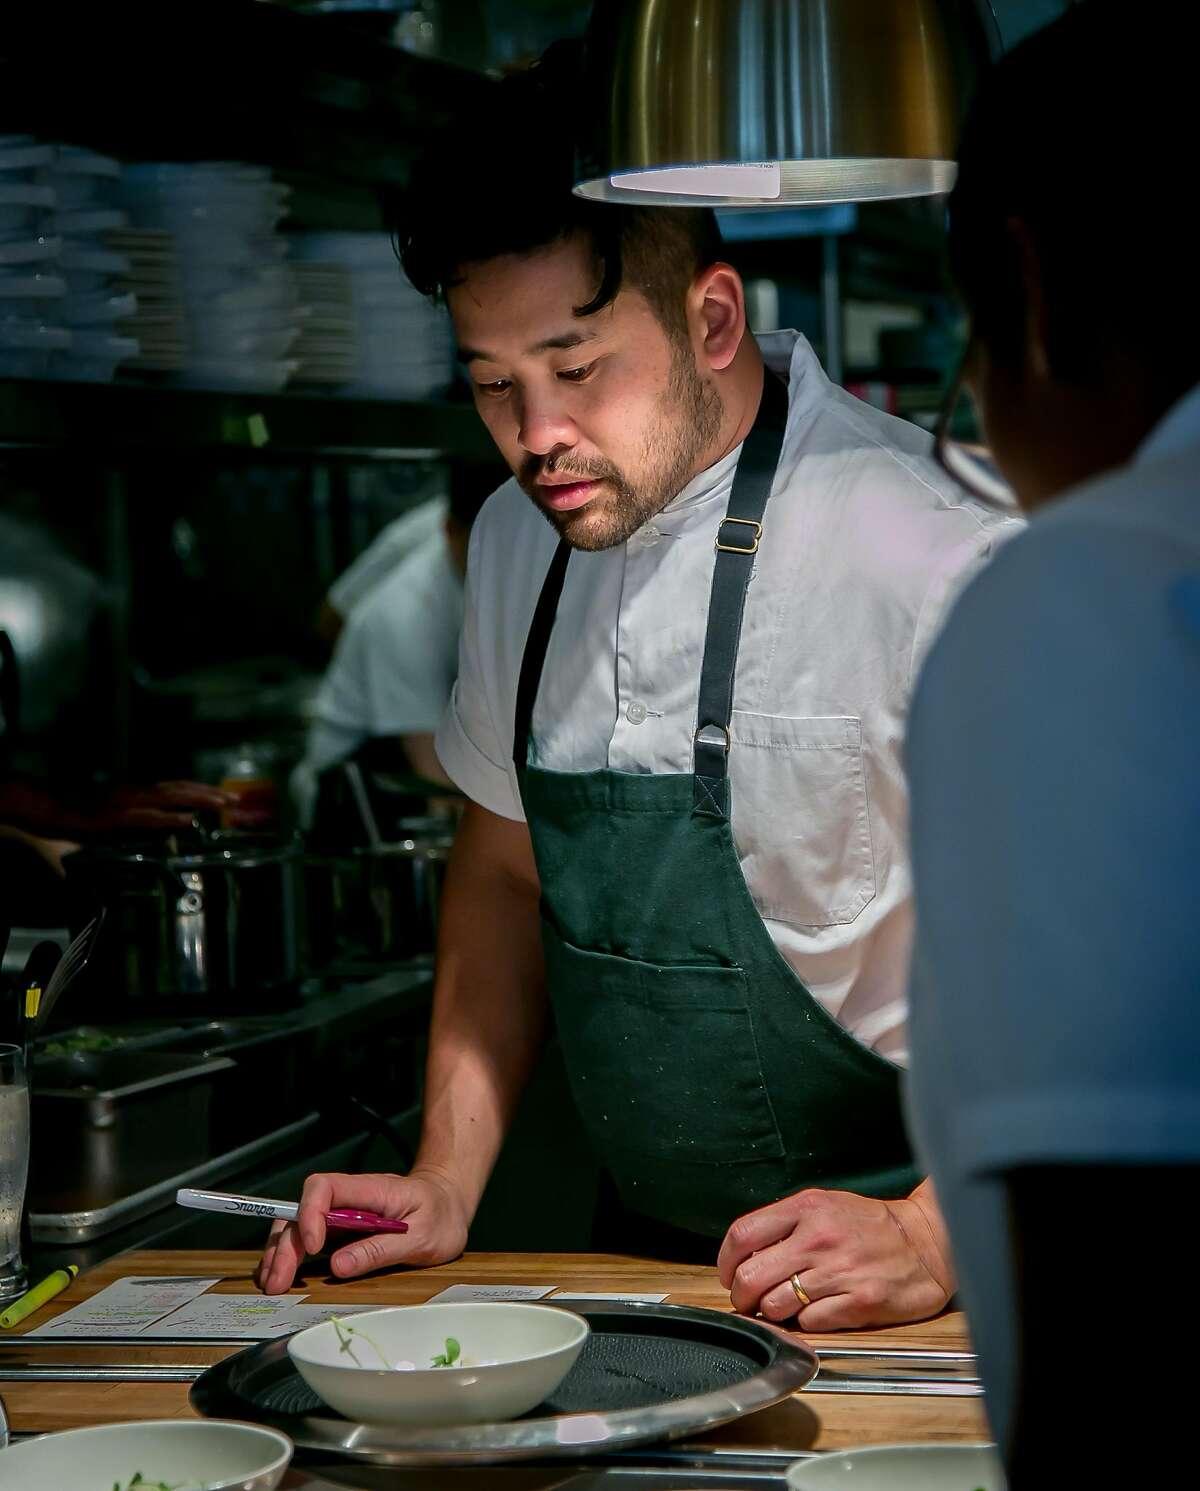 Chef Brandon Jew of Mister Jiu's in San Francisco, California is seen on June 4th, 2016.